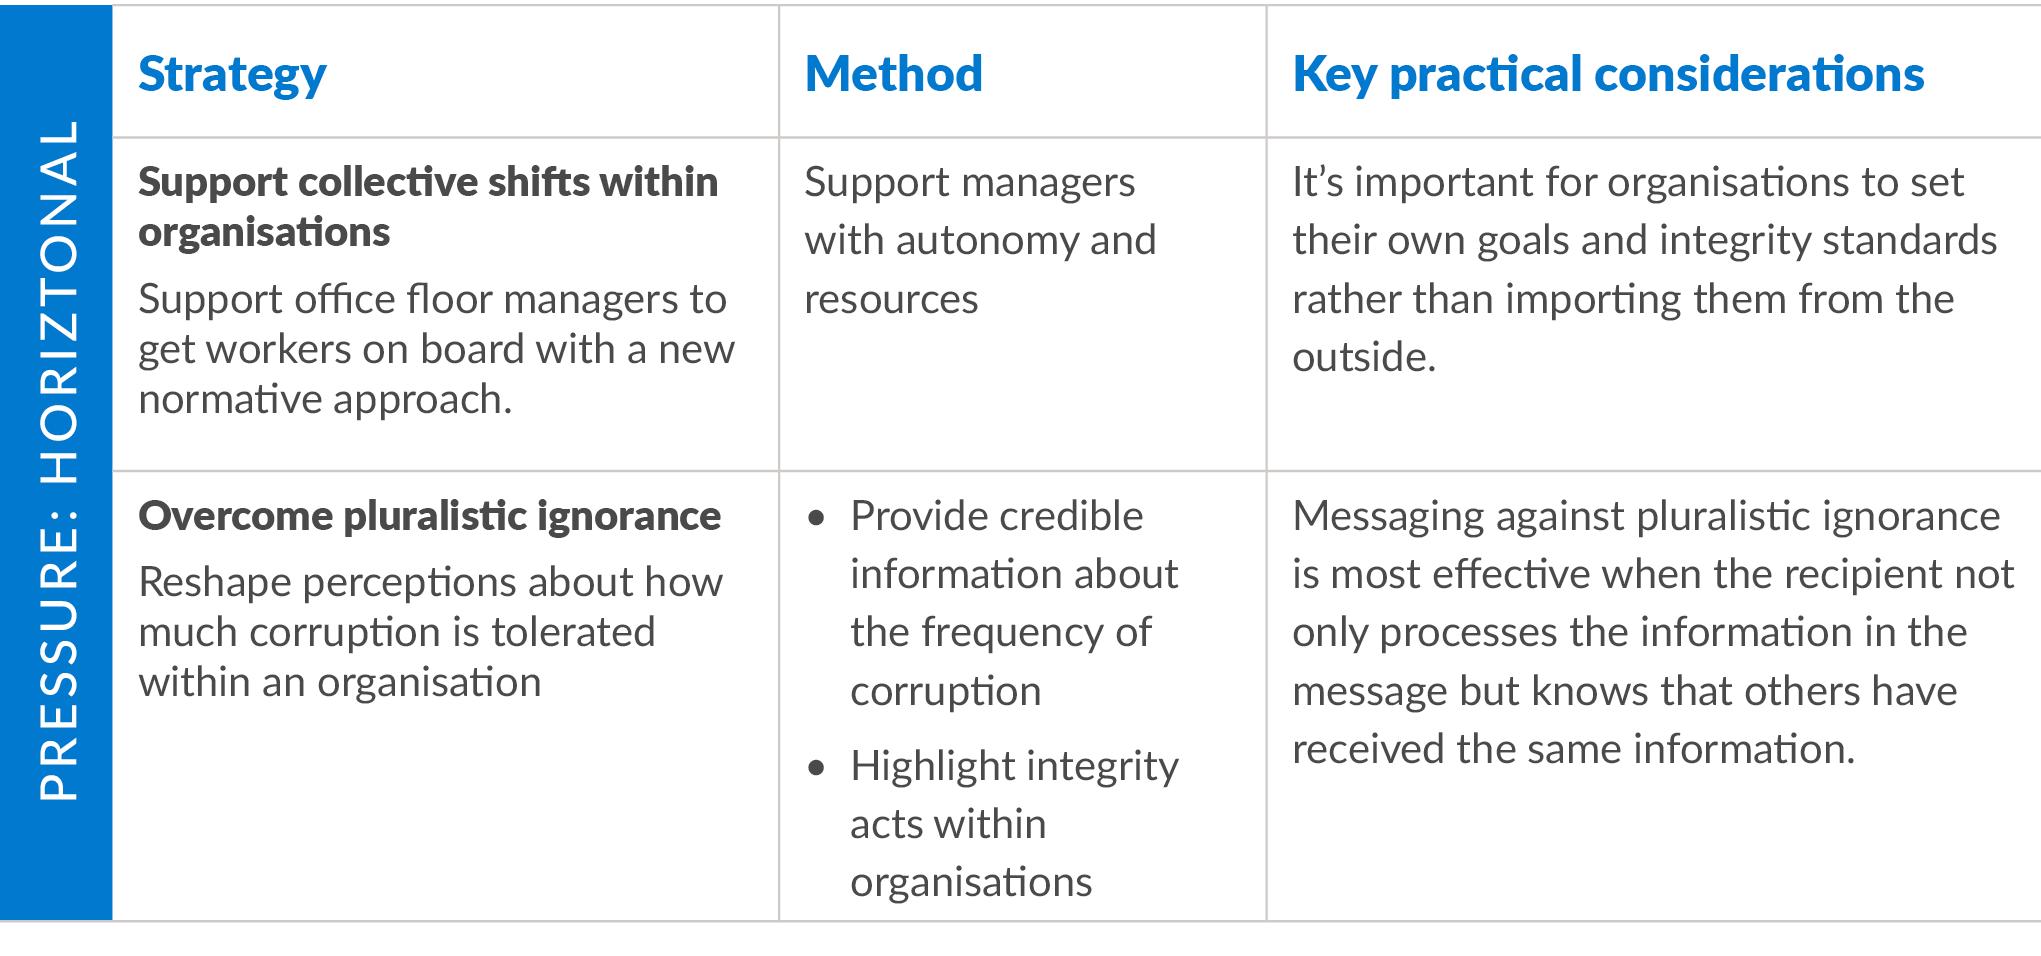 Table describing strategies, methods & considerations